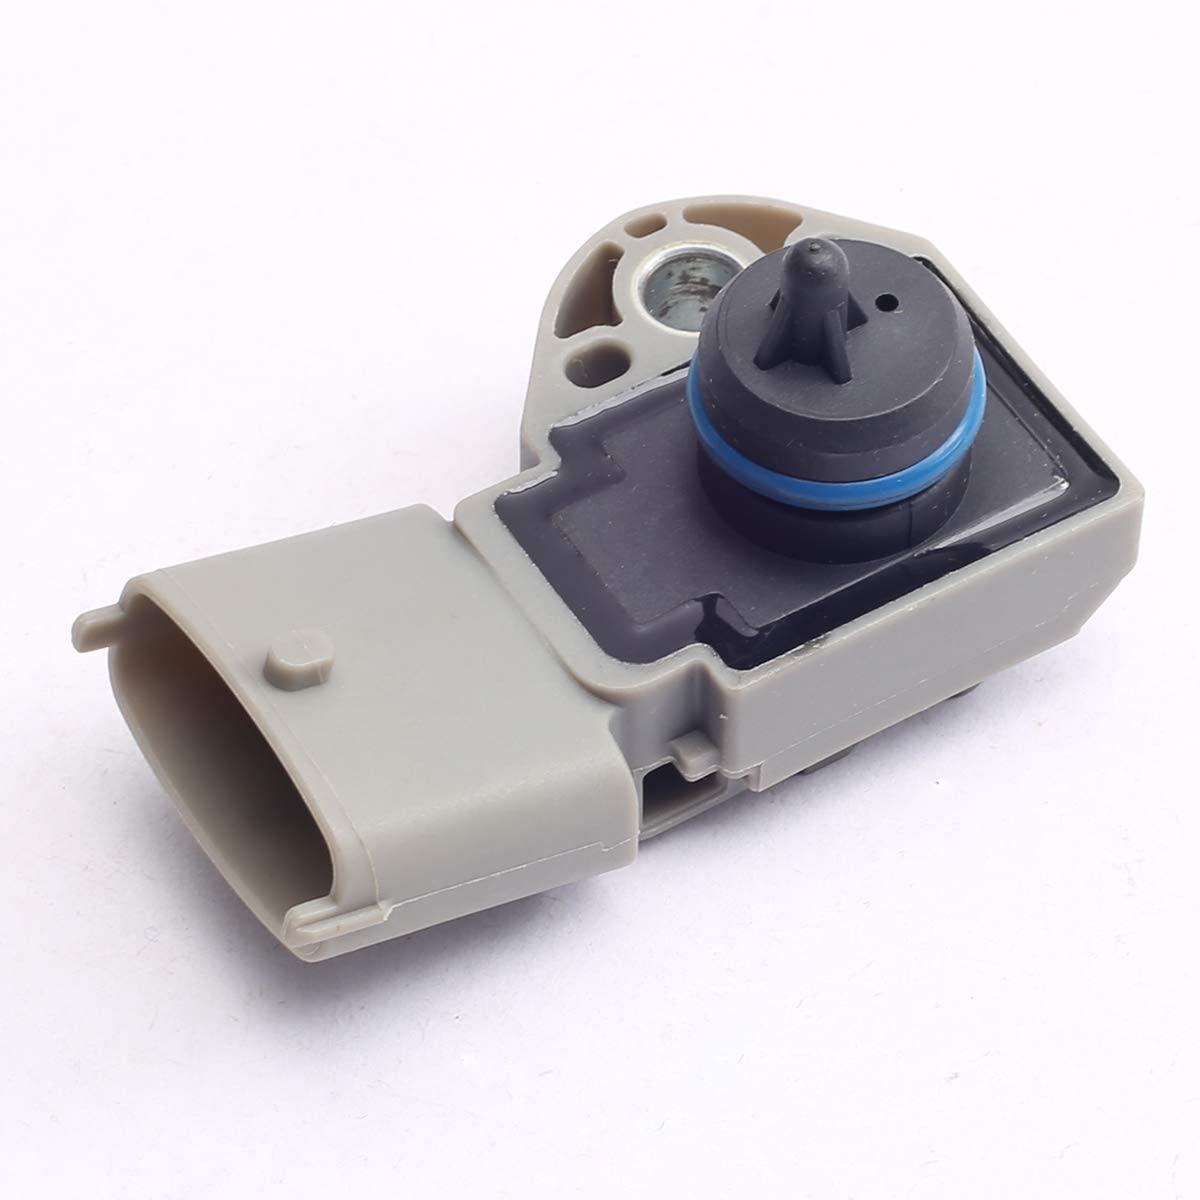 CENTAURUS Fuel Pressure Sensor 0261230238 Replacement for Ford Focus Kuga I Volvo C70 S40 S60 S80 V50 V60 XC60 XC70 XC90